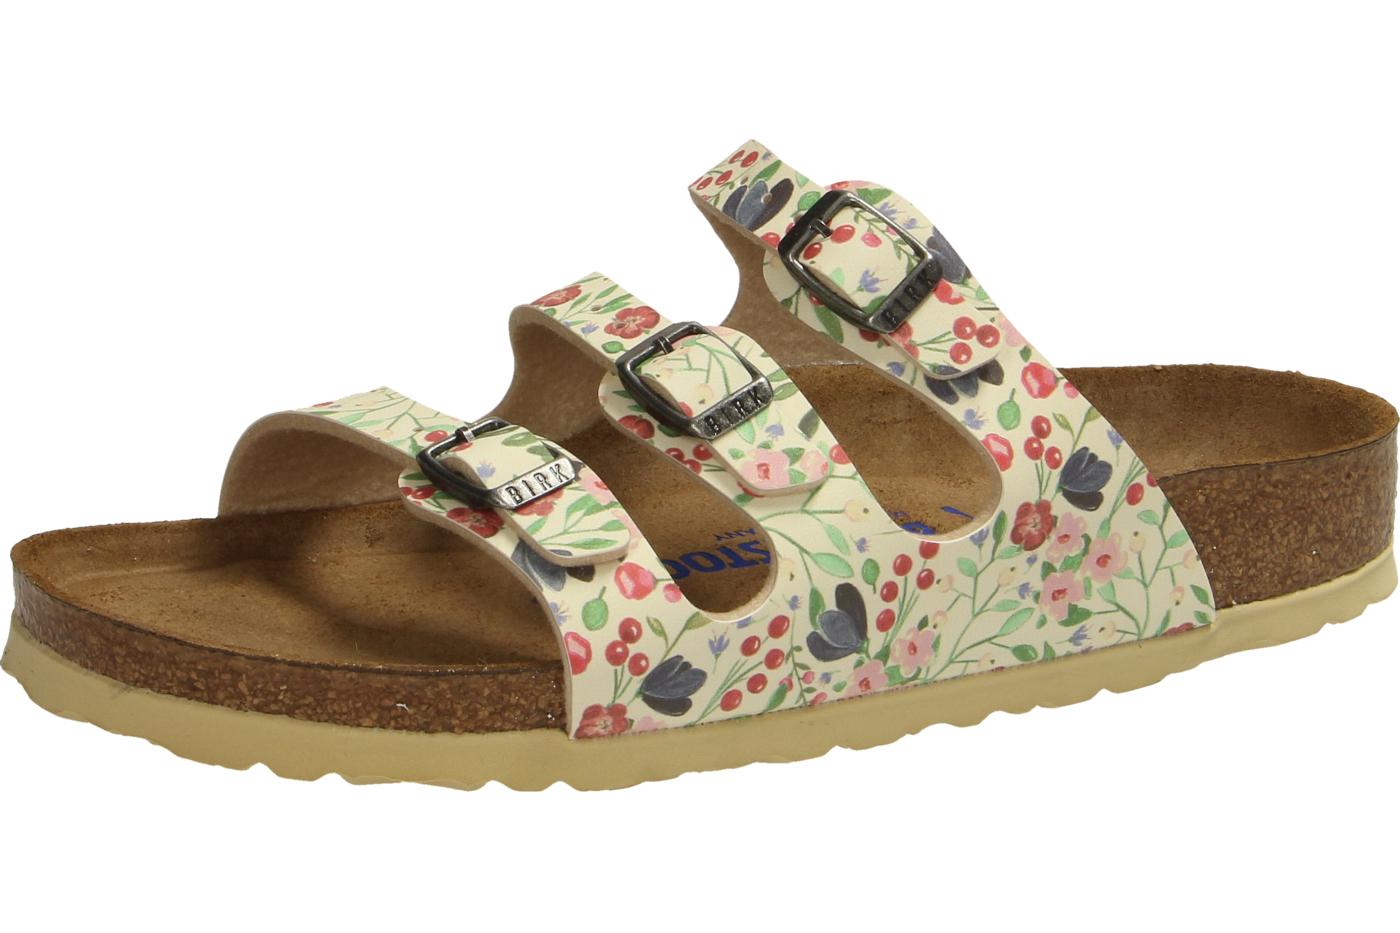 Birkenstock Florida BS[Sandals] Pantolette Pantolette 1012779 36